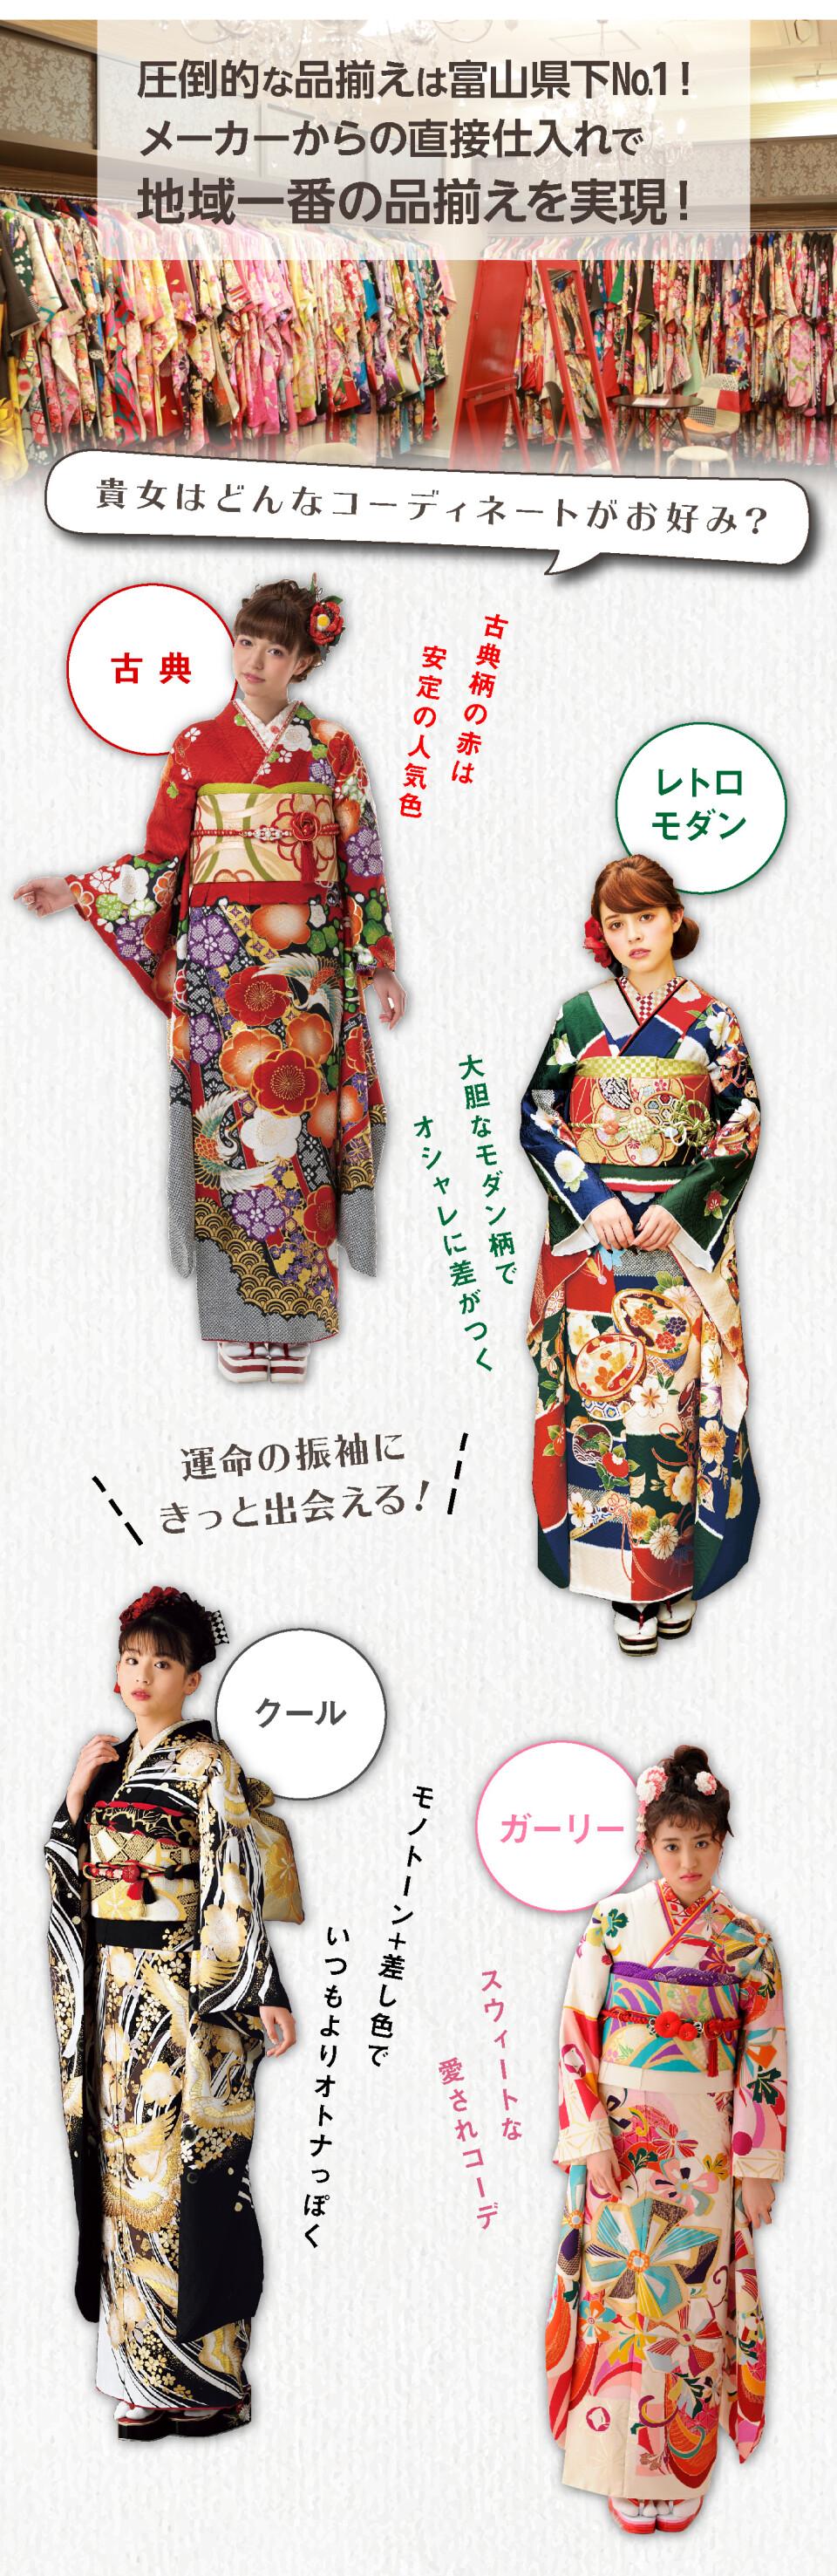 202008-profile_富山_2